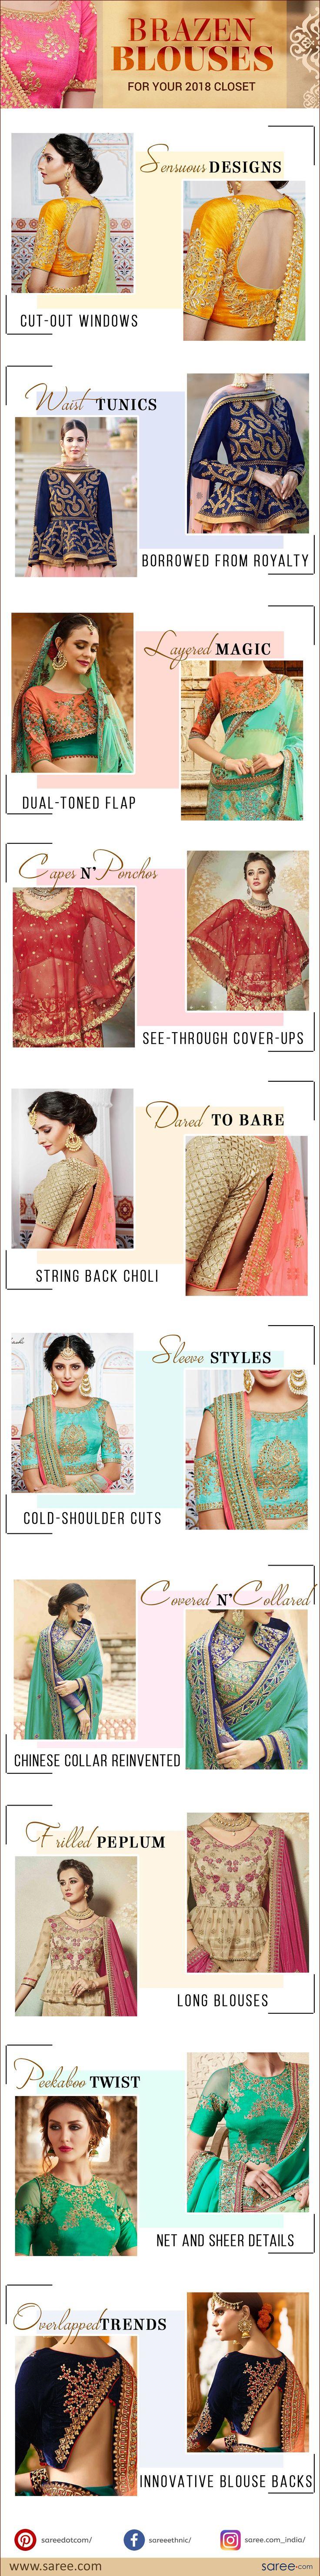 Ethnic Fashion Inspiration for 2018 - Trending Latest Saree and Lehenga Blouse Designs